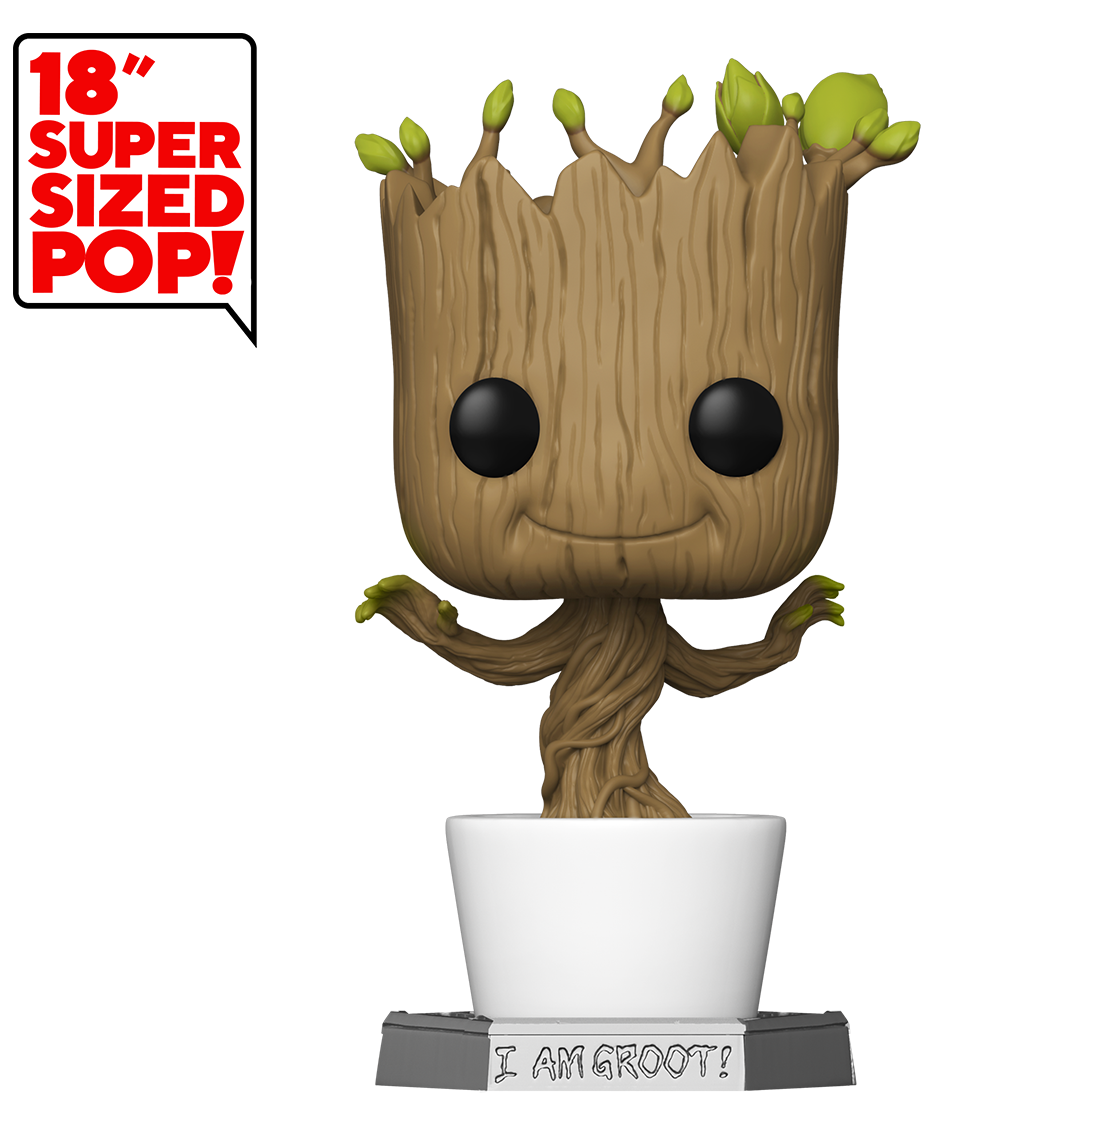 "Guardians of the Galaxy: Groot (Dancing) - 18"" Super-Sized Pop! Vinyl Figure image"